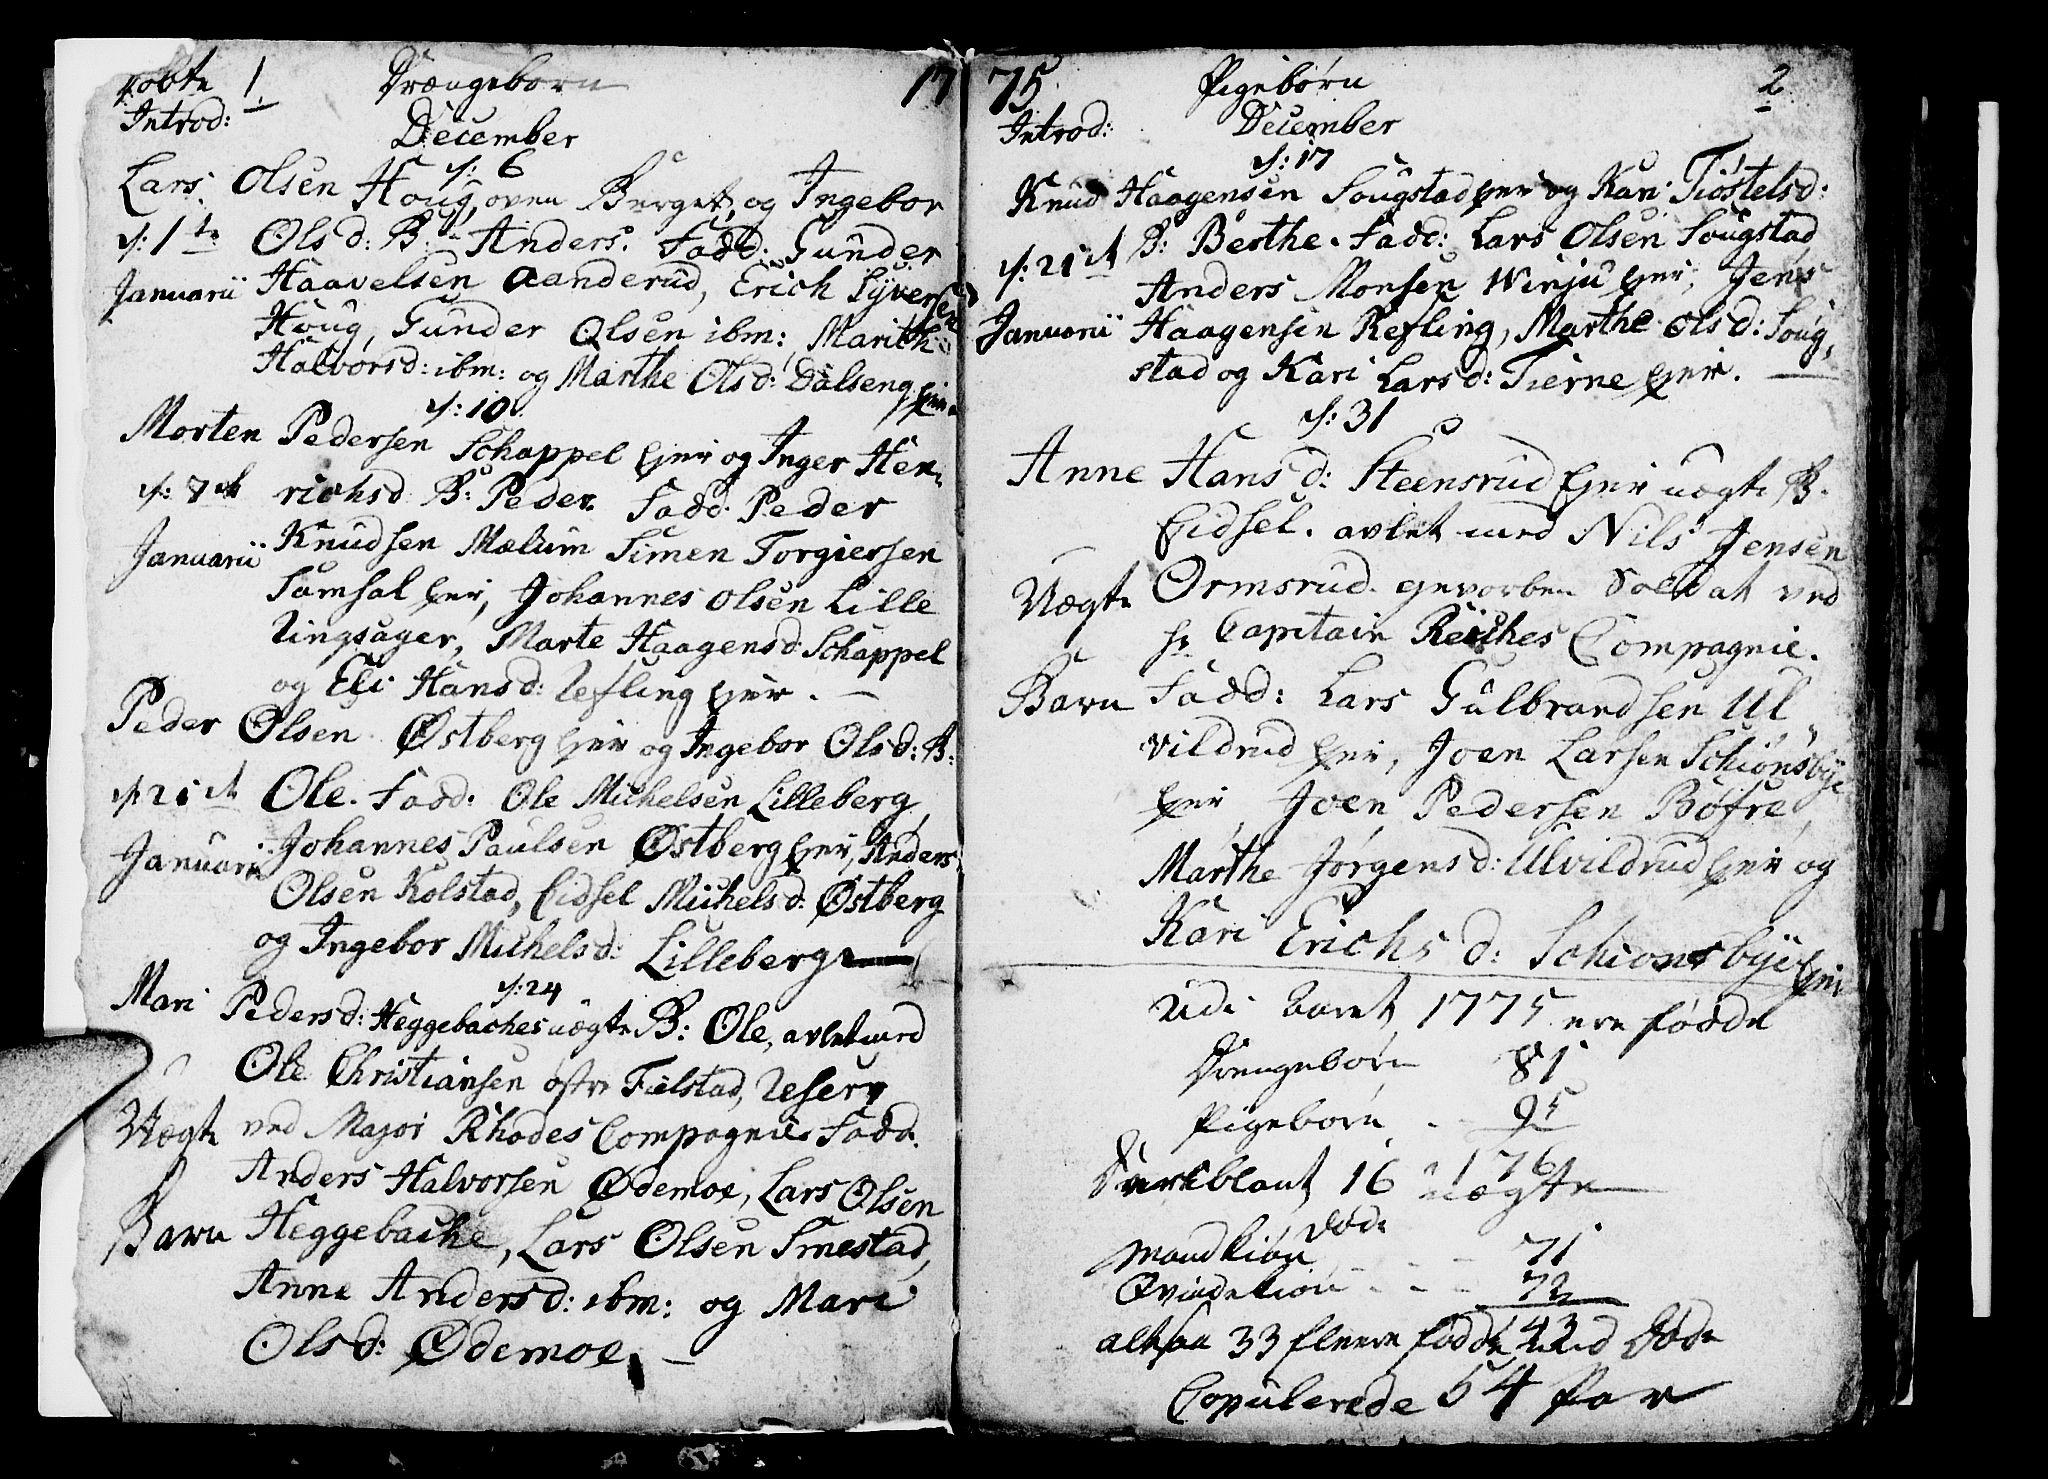 SAH, Ringsaker prestekontor, I/Ia/L0005/0002: Kladd til kirkebok nr. 1B, 1775-1779, s. 1-2